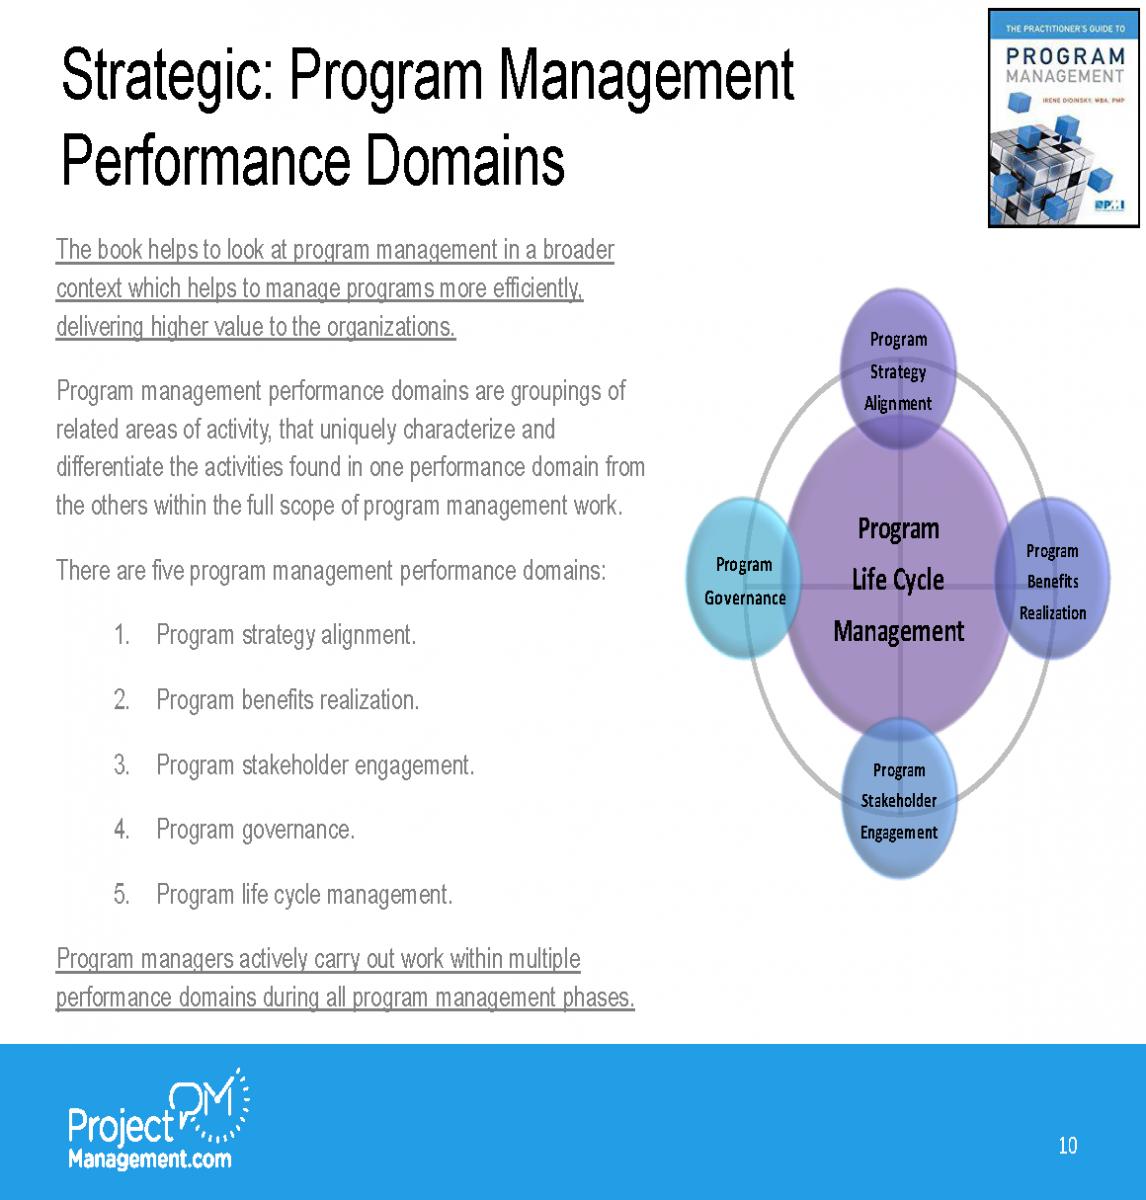 ProjectManagementcom webinar_Irene Didinsky_05112018_FinalFinal_Page_14